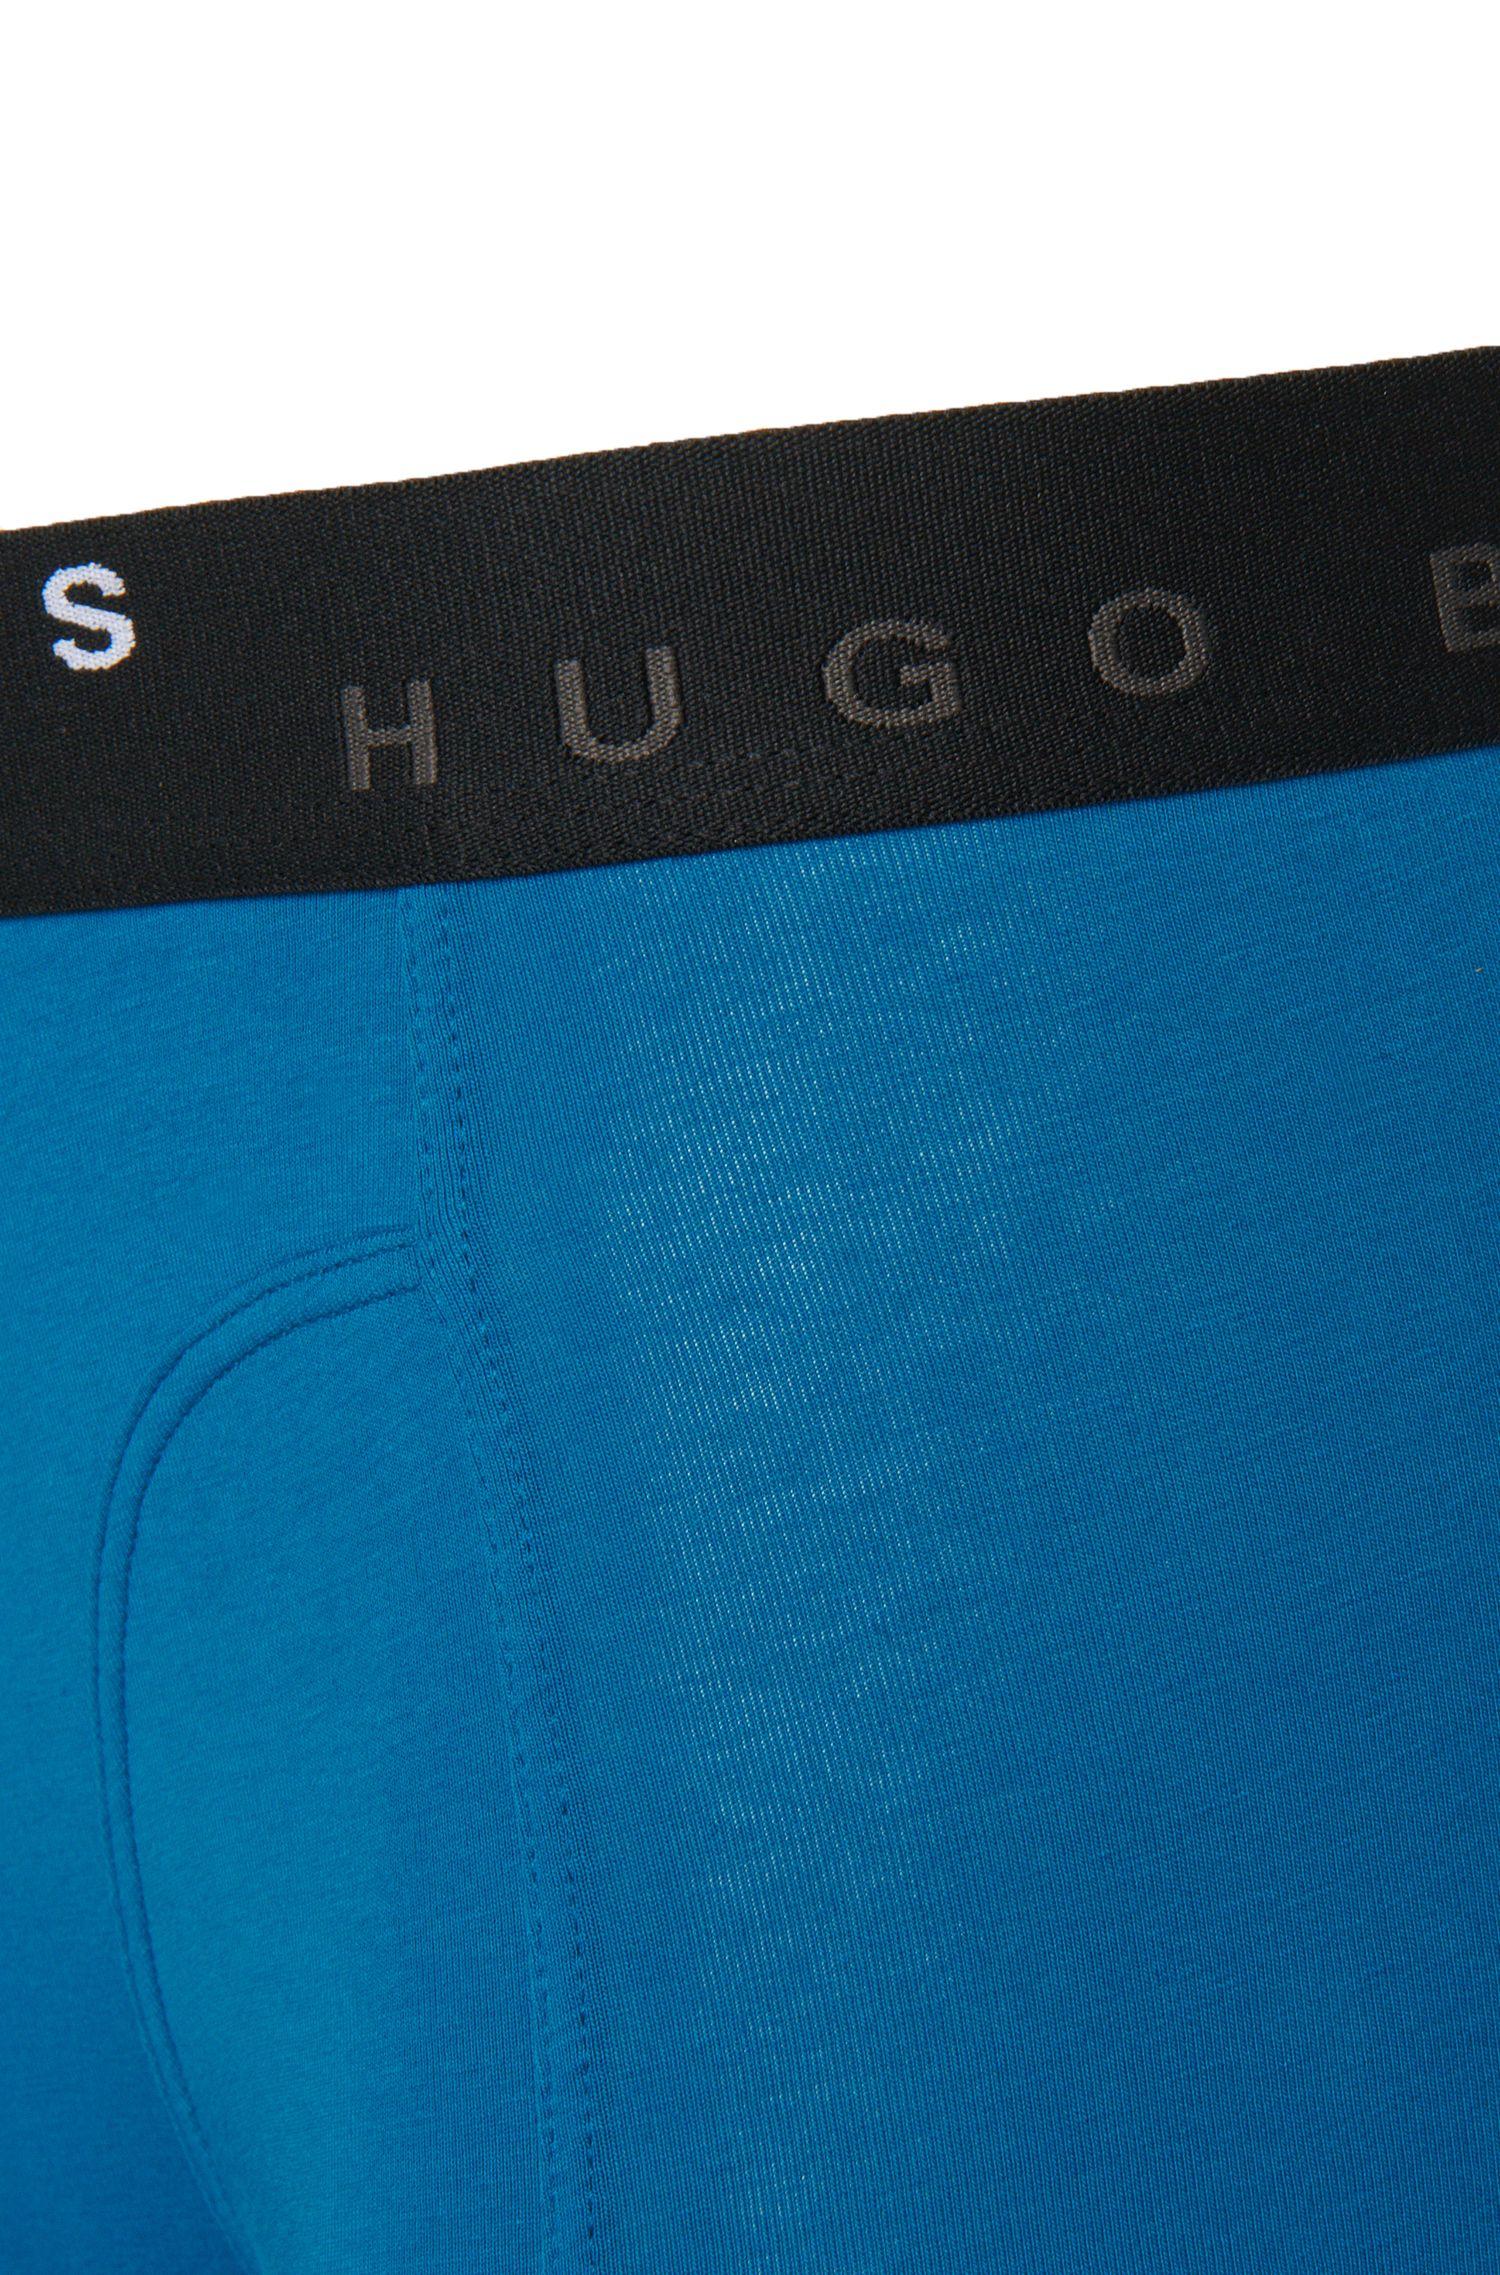 Stretch Cotton Boxer Briefs, 2-Pack | Boxer Brief 2P Solid, Open Blue